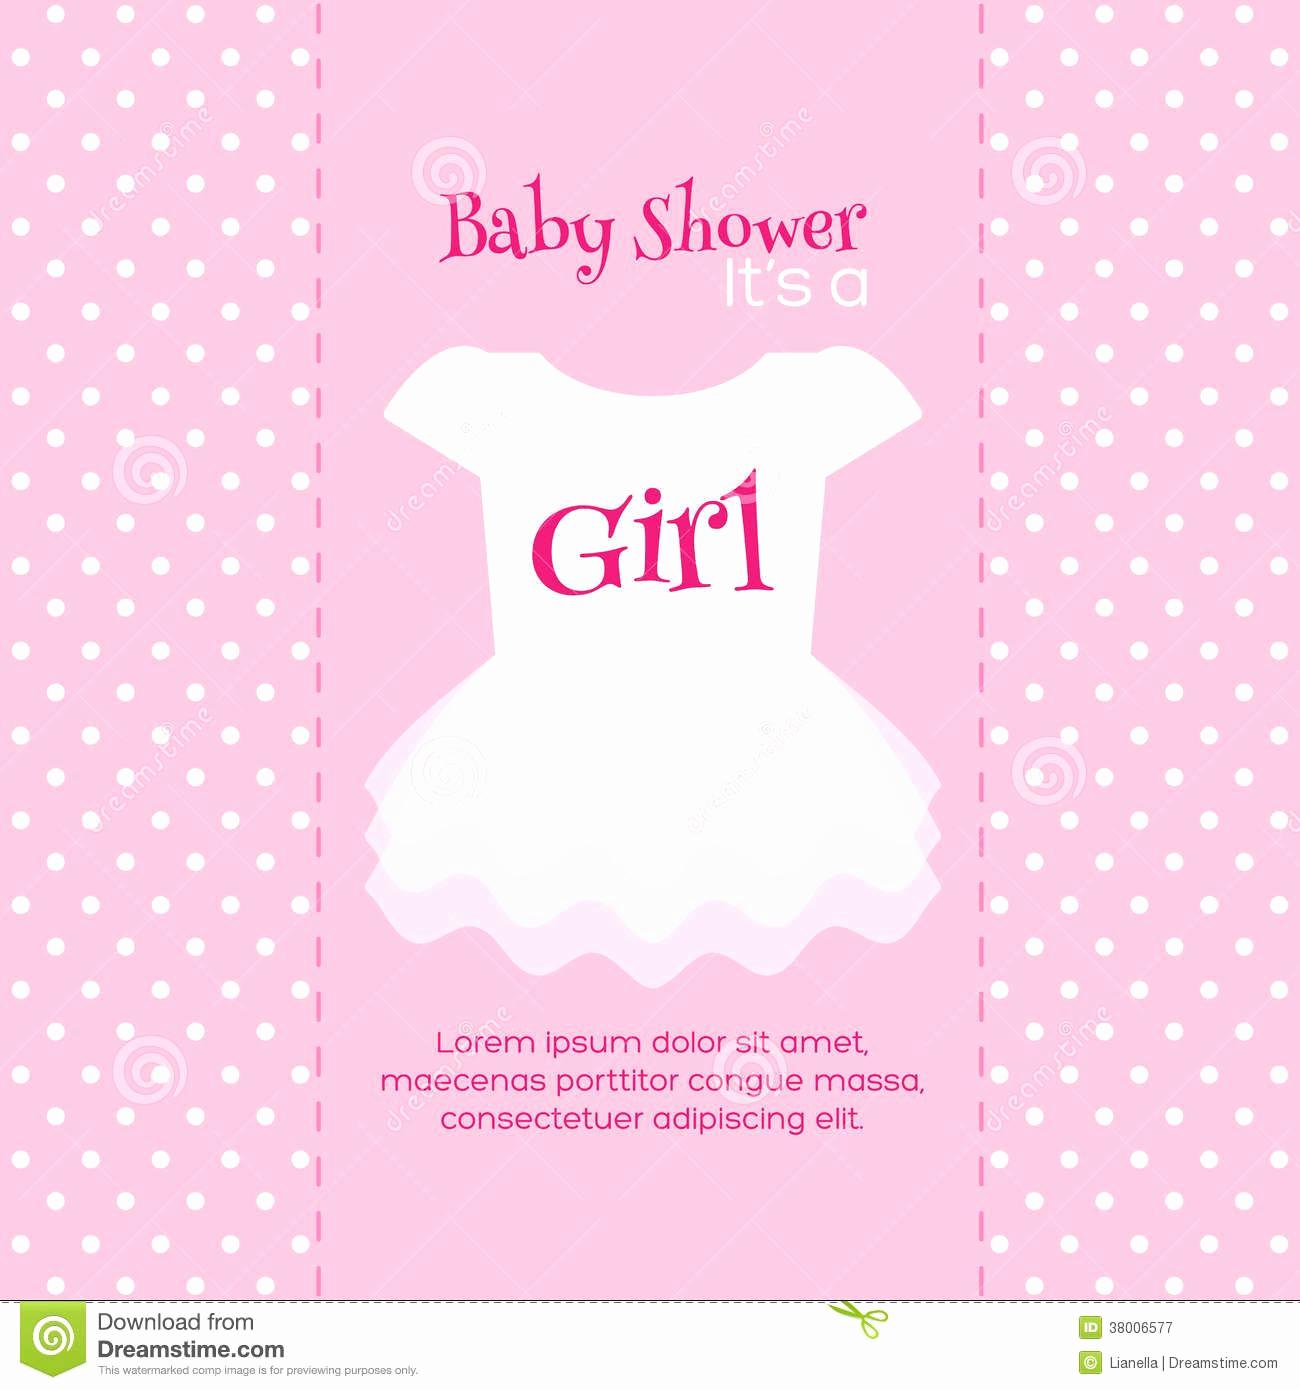 Girl Baby Shower Invitation Fresh Design Free Printable Baby Shower Invitations for Girls